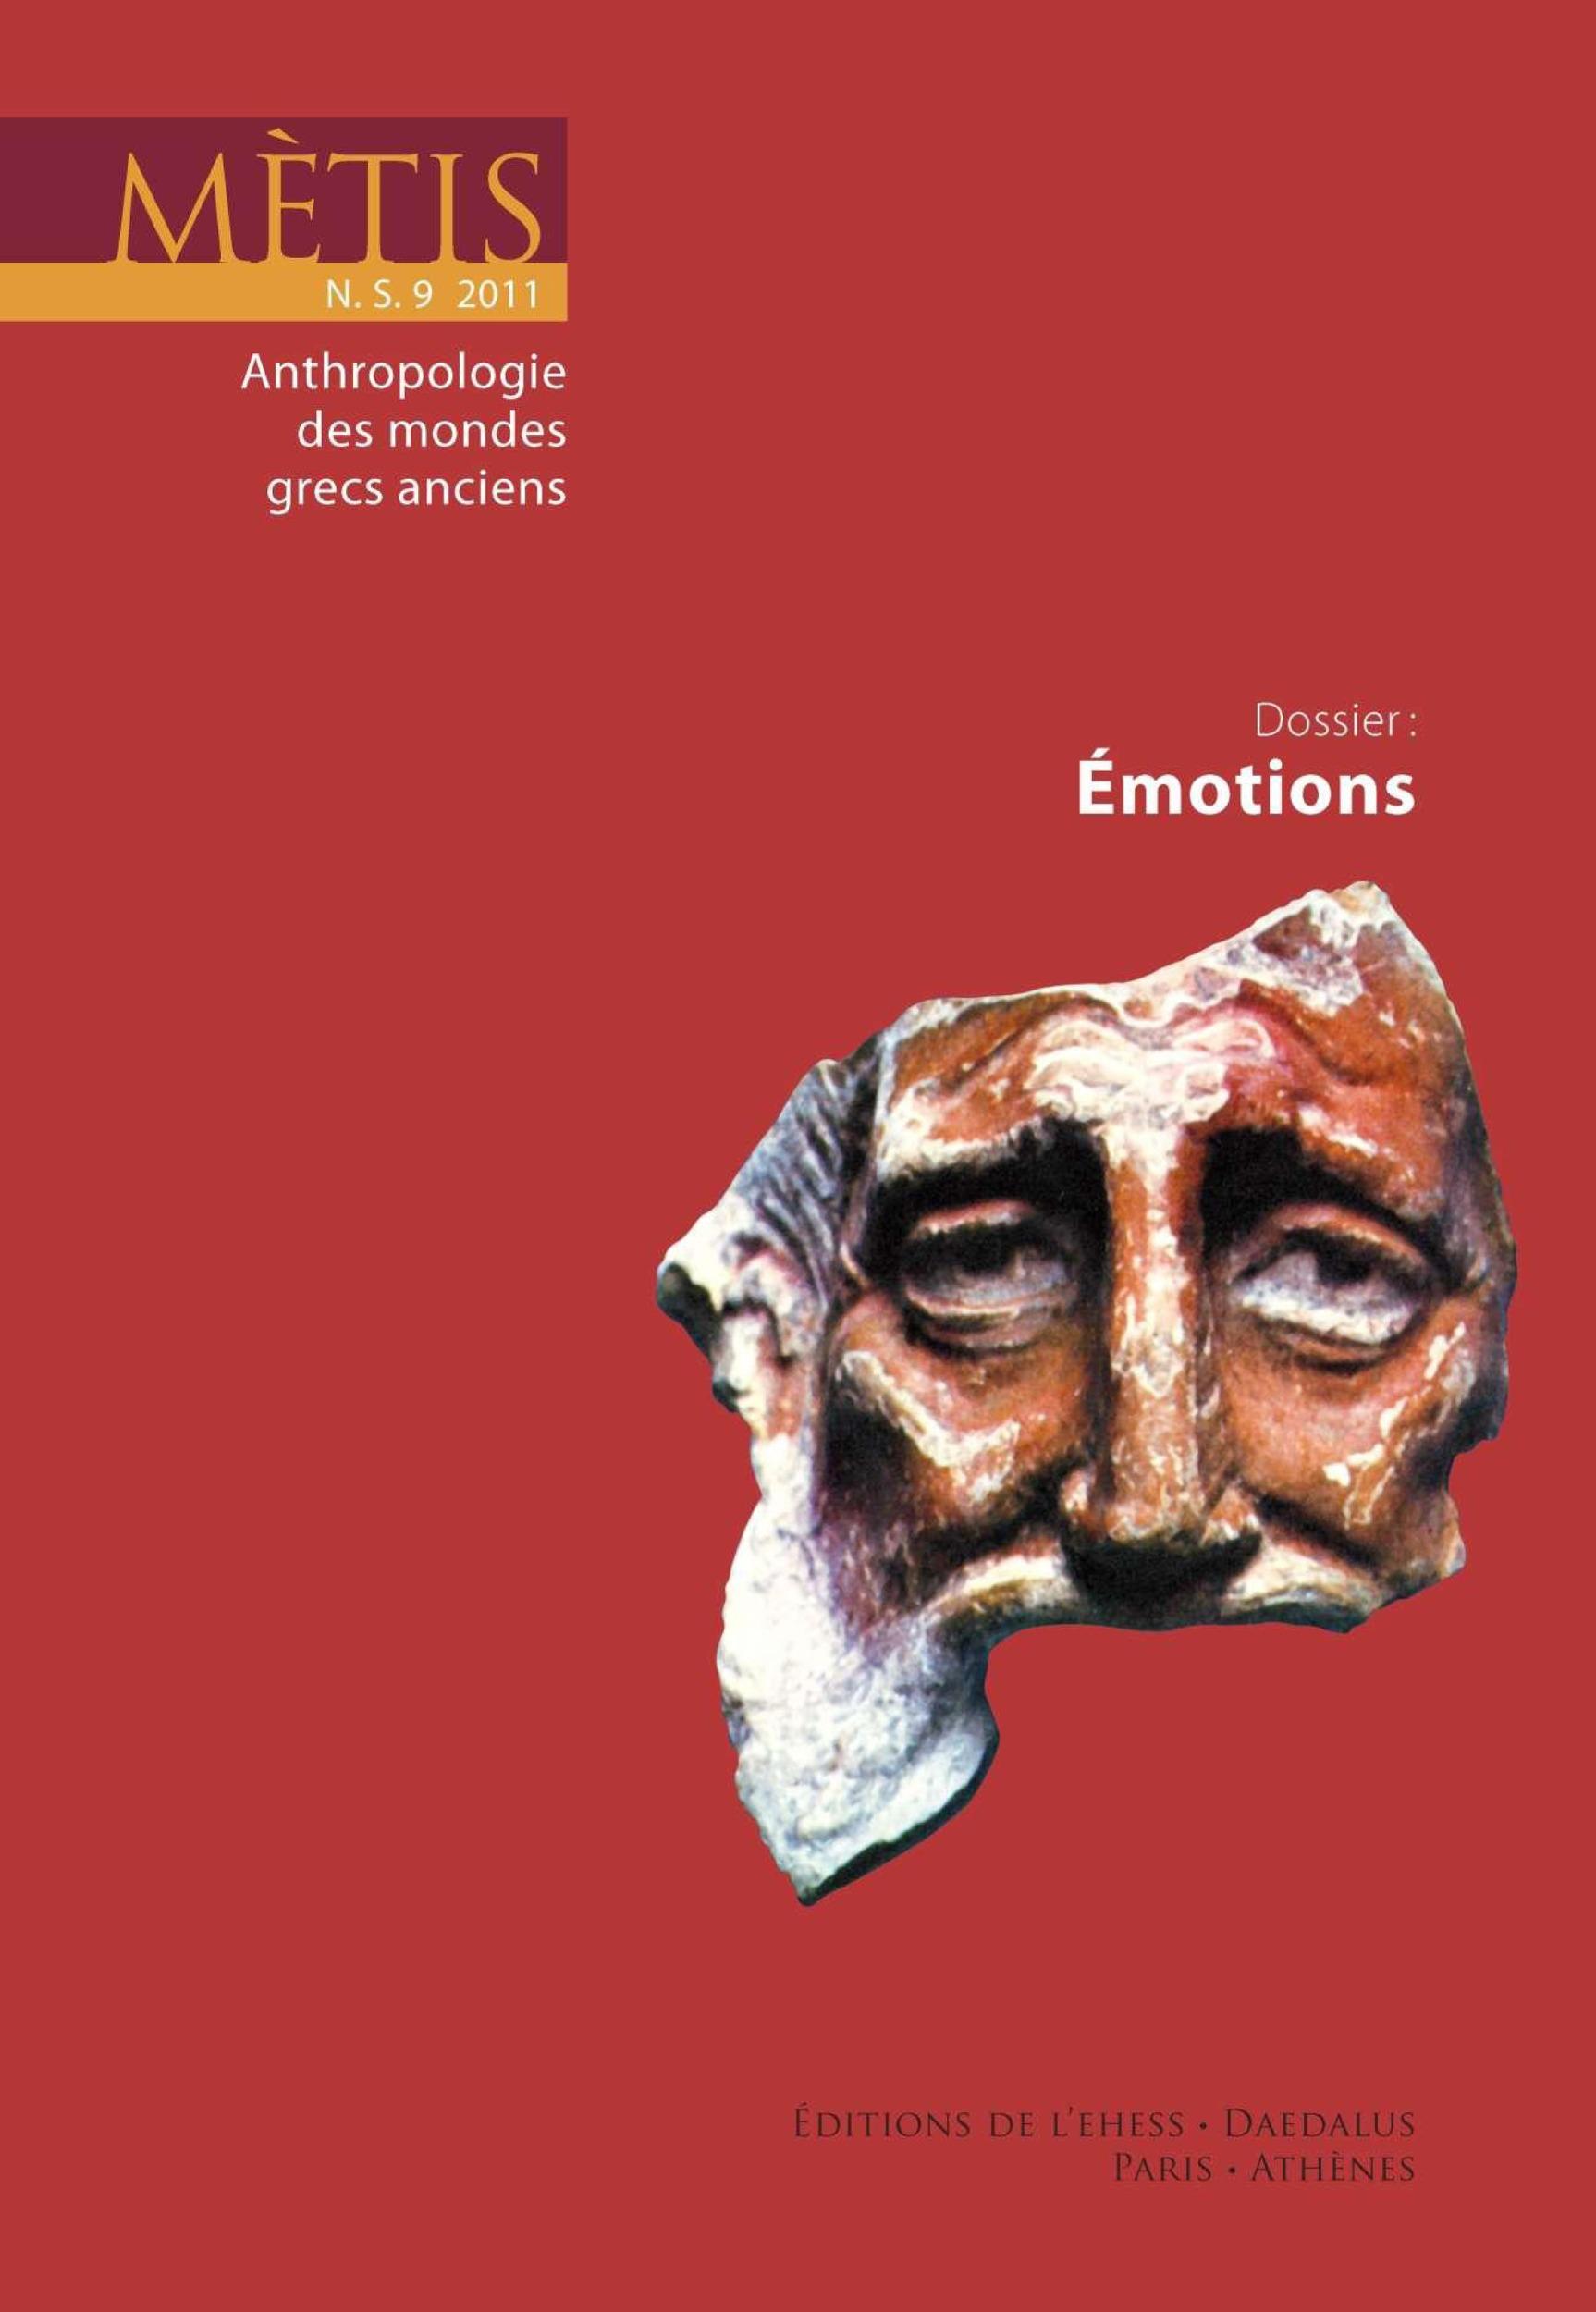 Dossier : Émotions